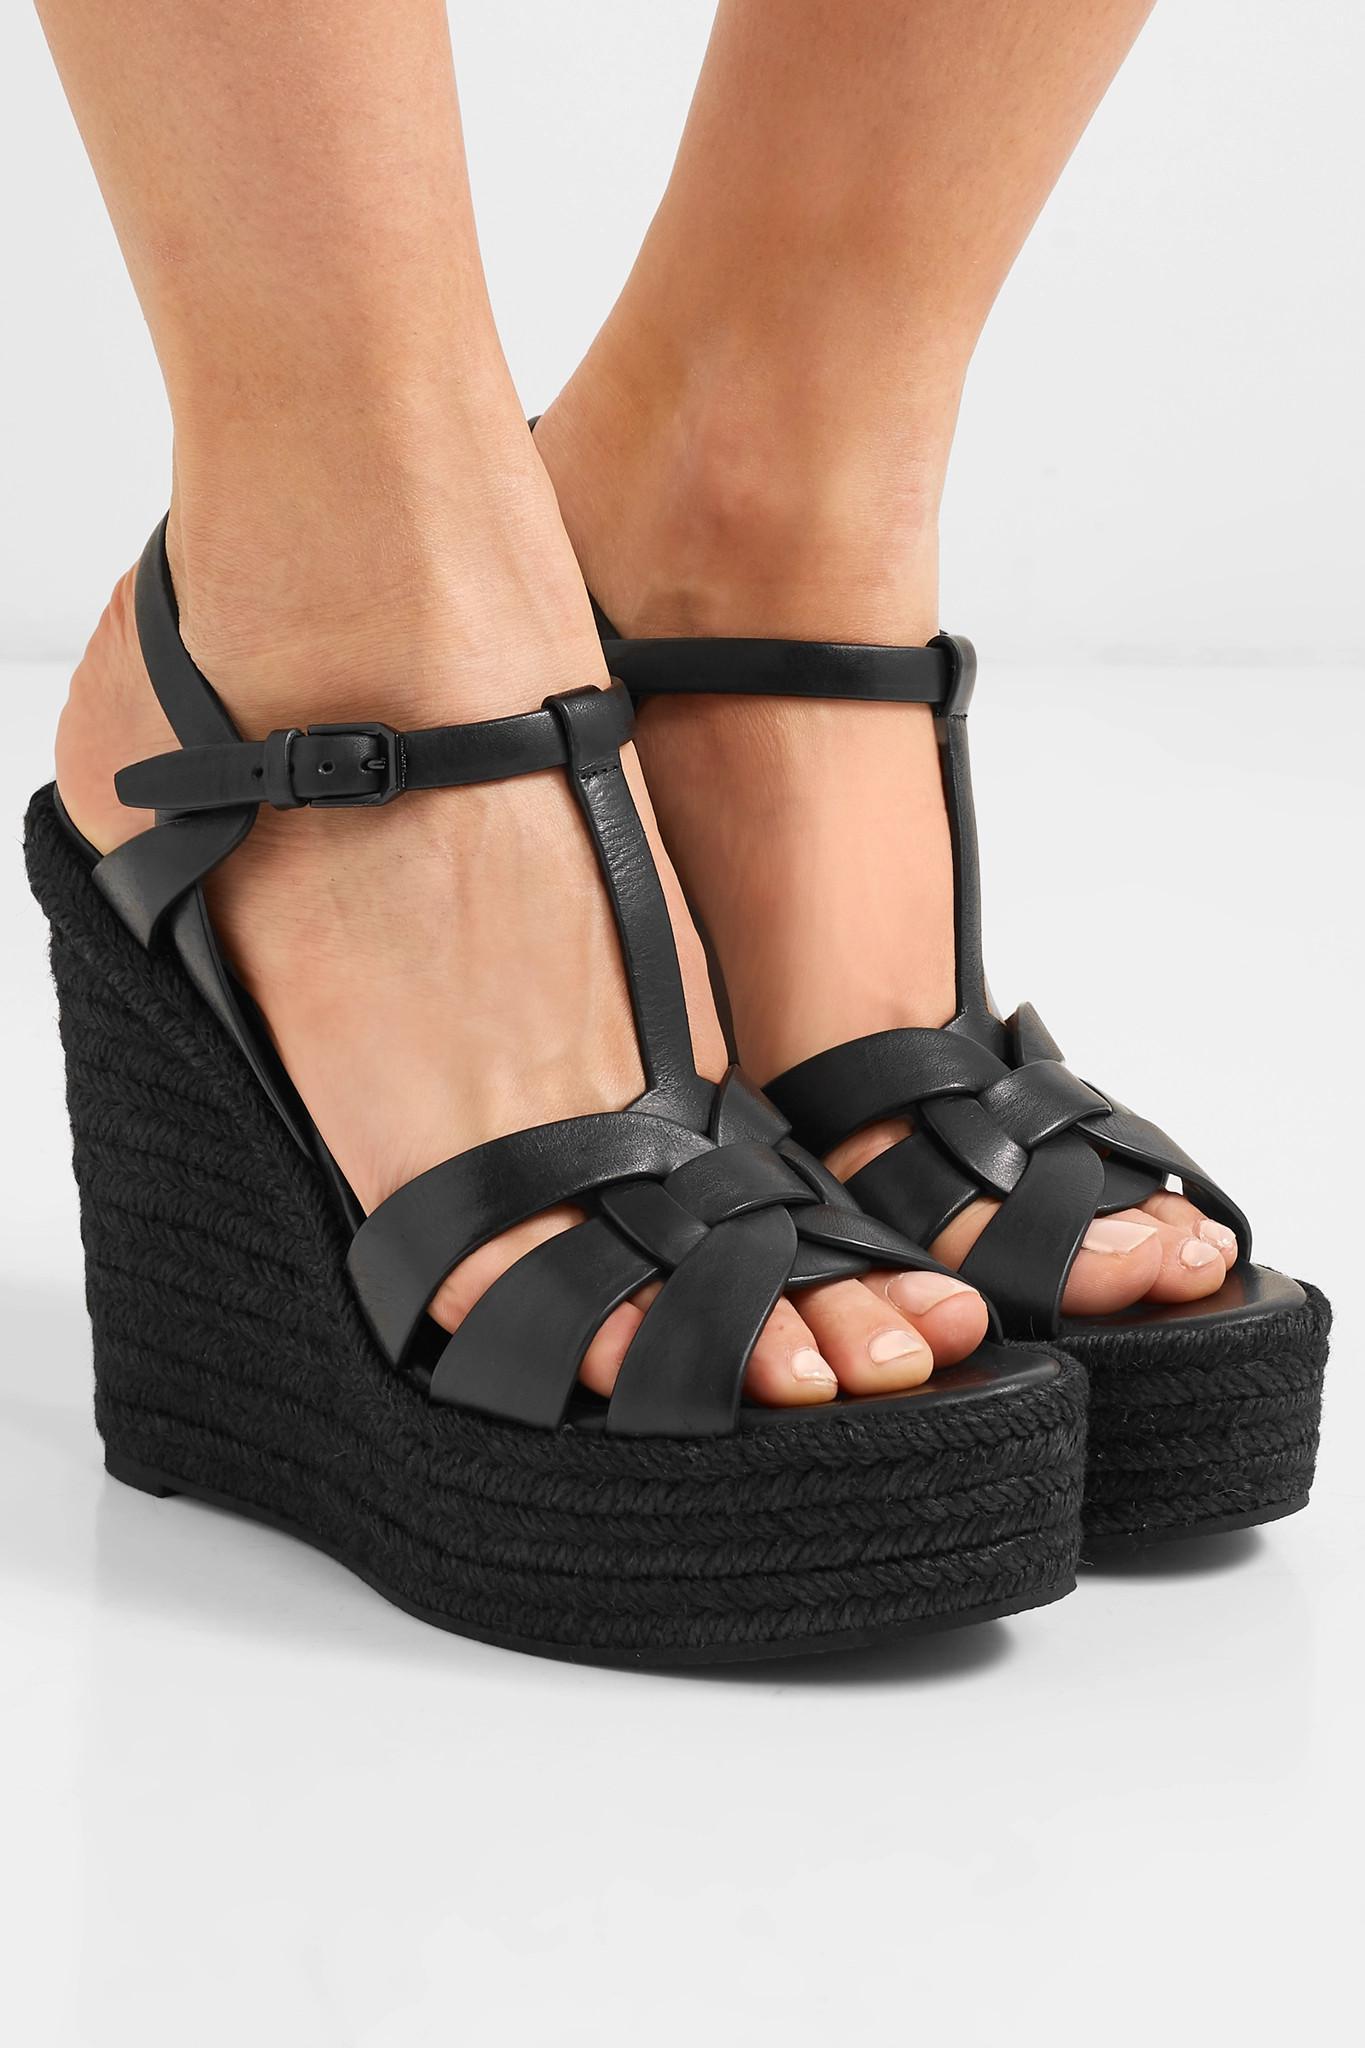 a978695b3702c Saint Laurent - Black Shoes Women - Lyst. View fullscreen